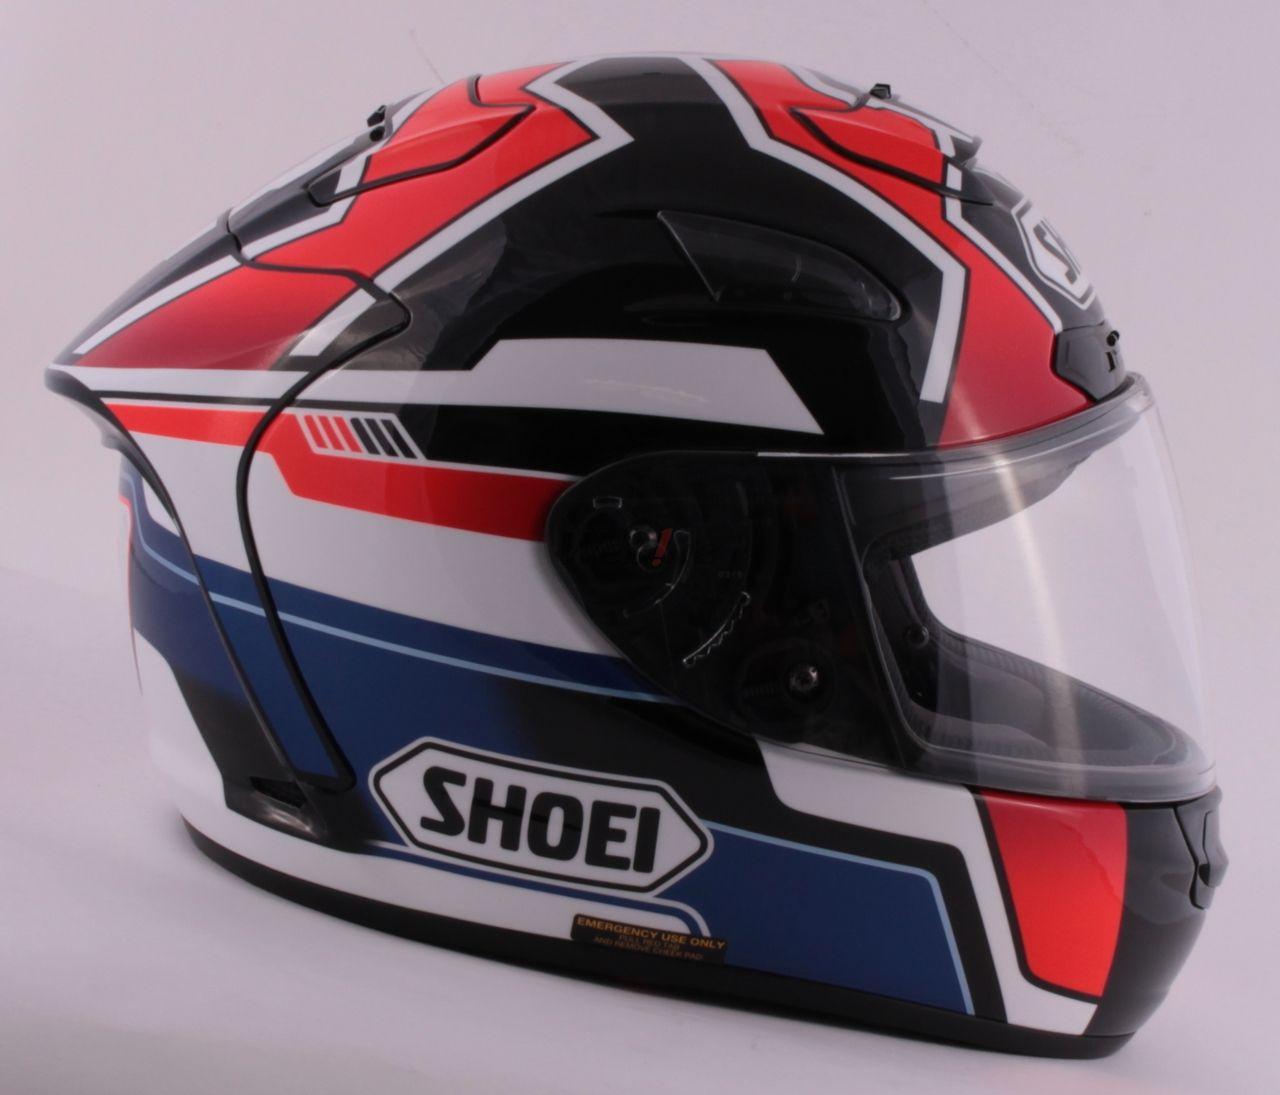 【SHOEI】X-TWELVE(X12) MARQUEZ 全罩式安全帽 - 「Webike-摩托百貨」